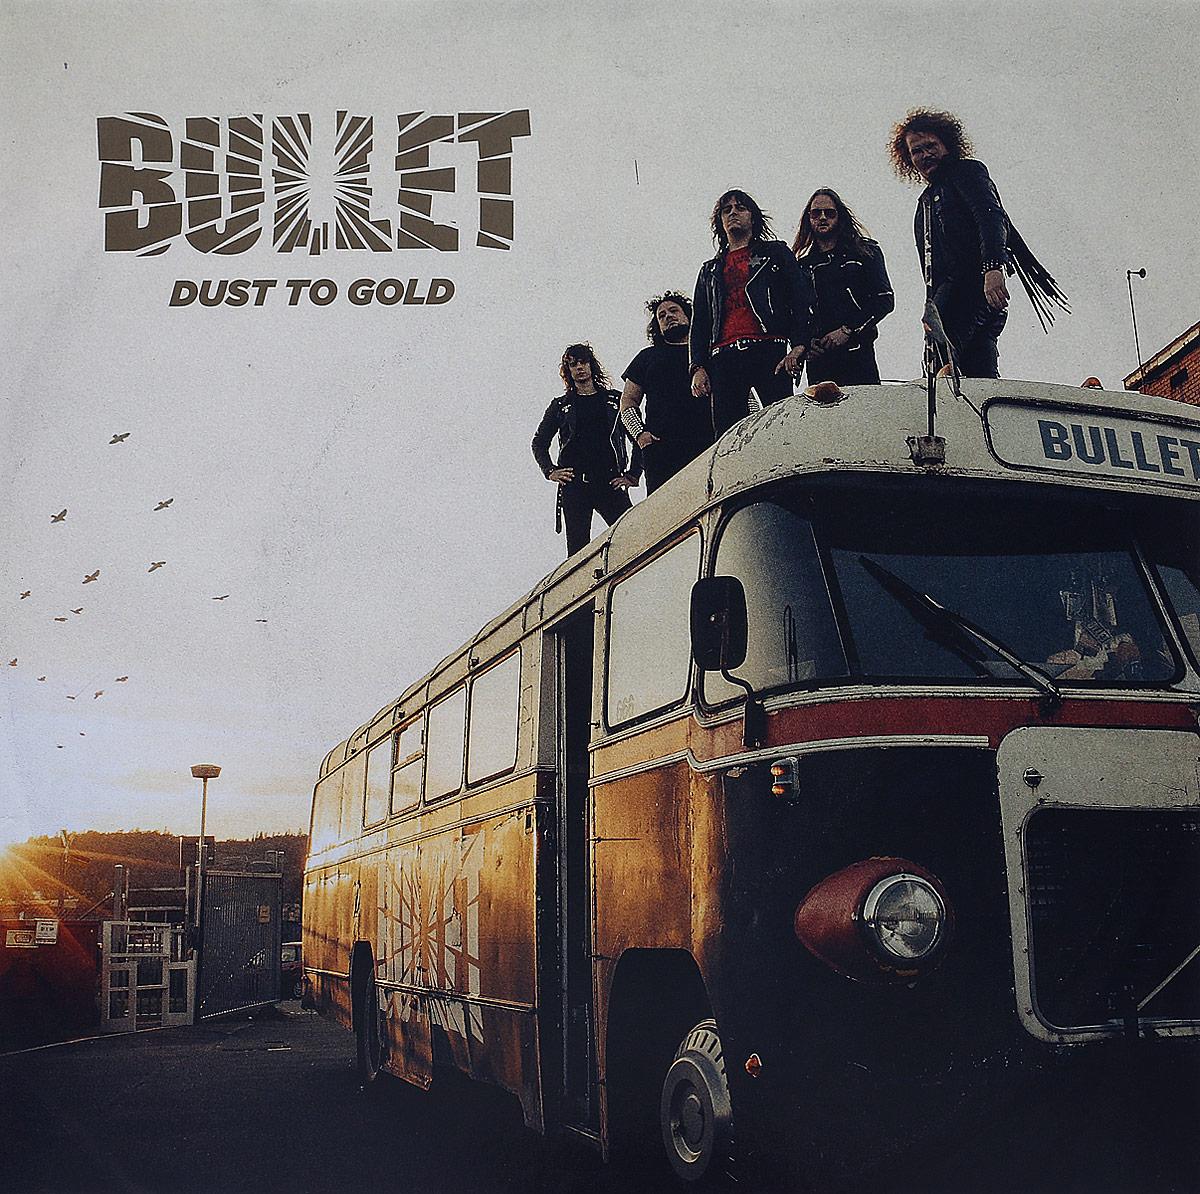 Крис Буллет Bullet. Dust To Gold (2 LP + CD) bullet height bullet height no atonement lp cd